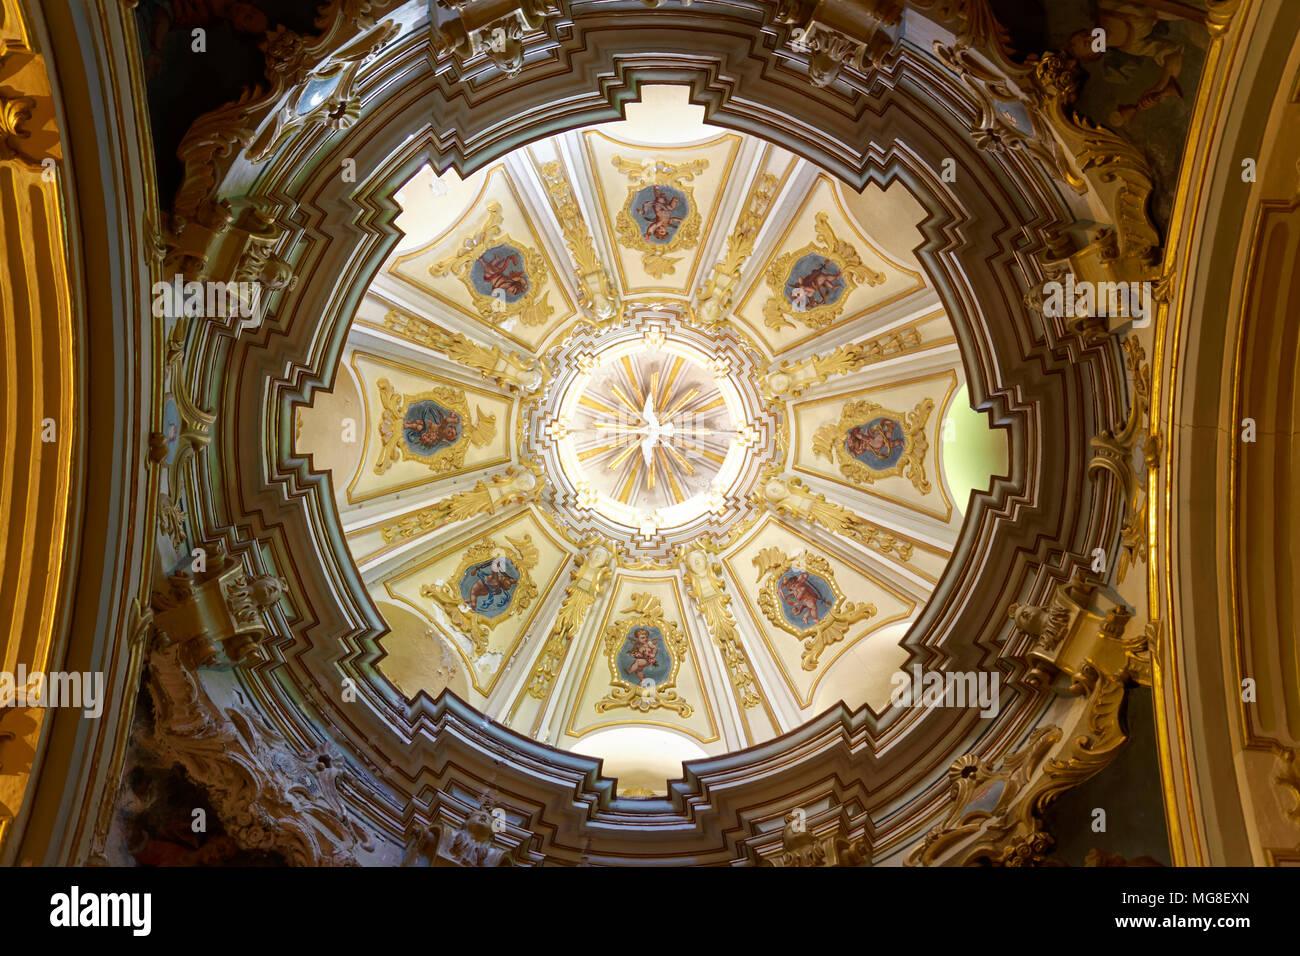 Vaulted ceiling, dome over side altar, interior, Church of St. Bartholomew, Roman Catholic parish church - Stock Image